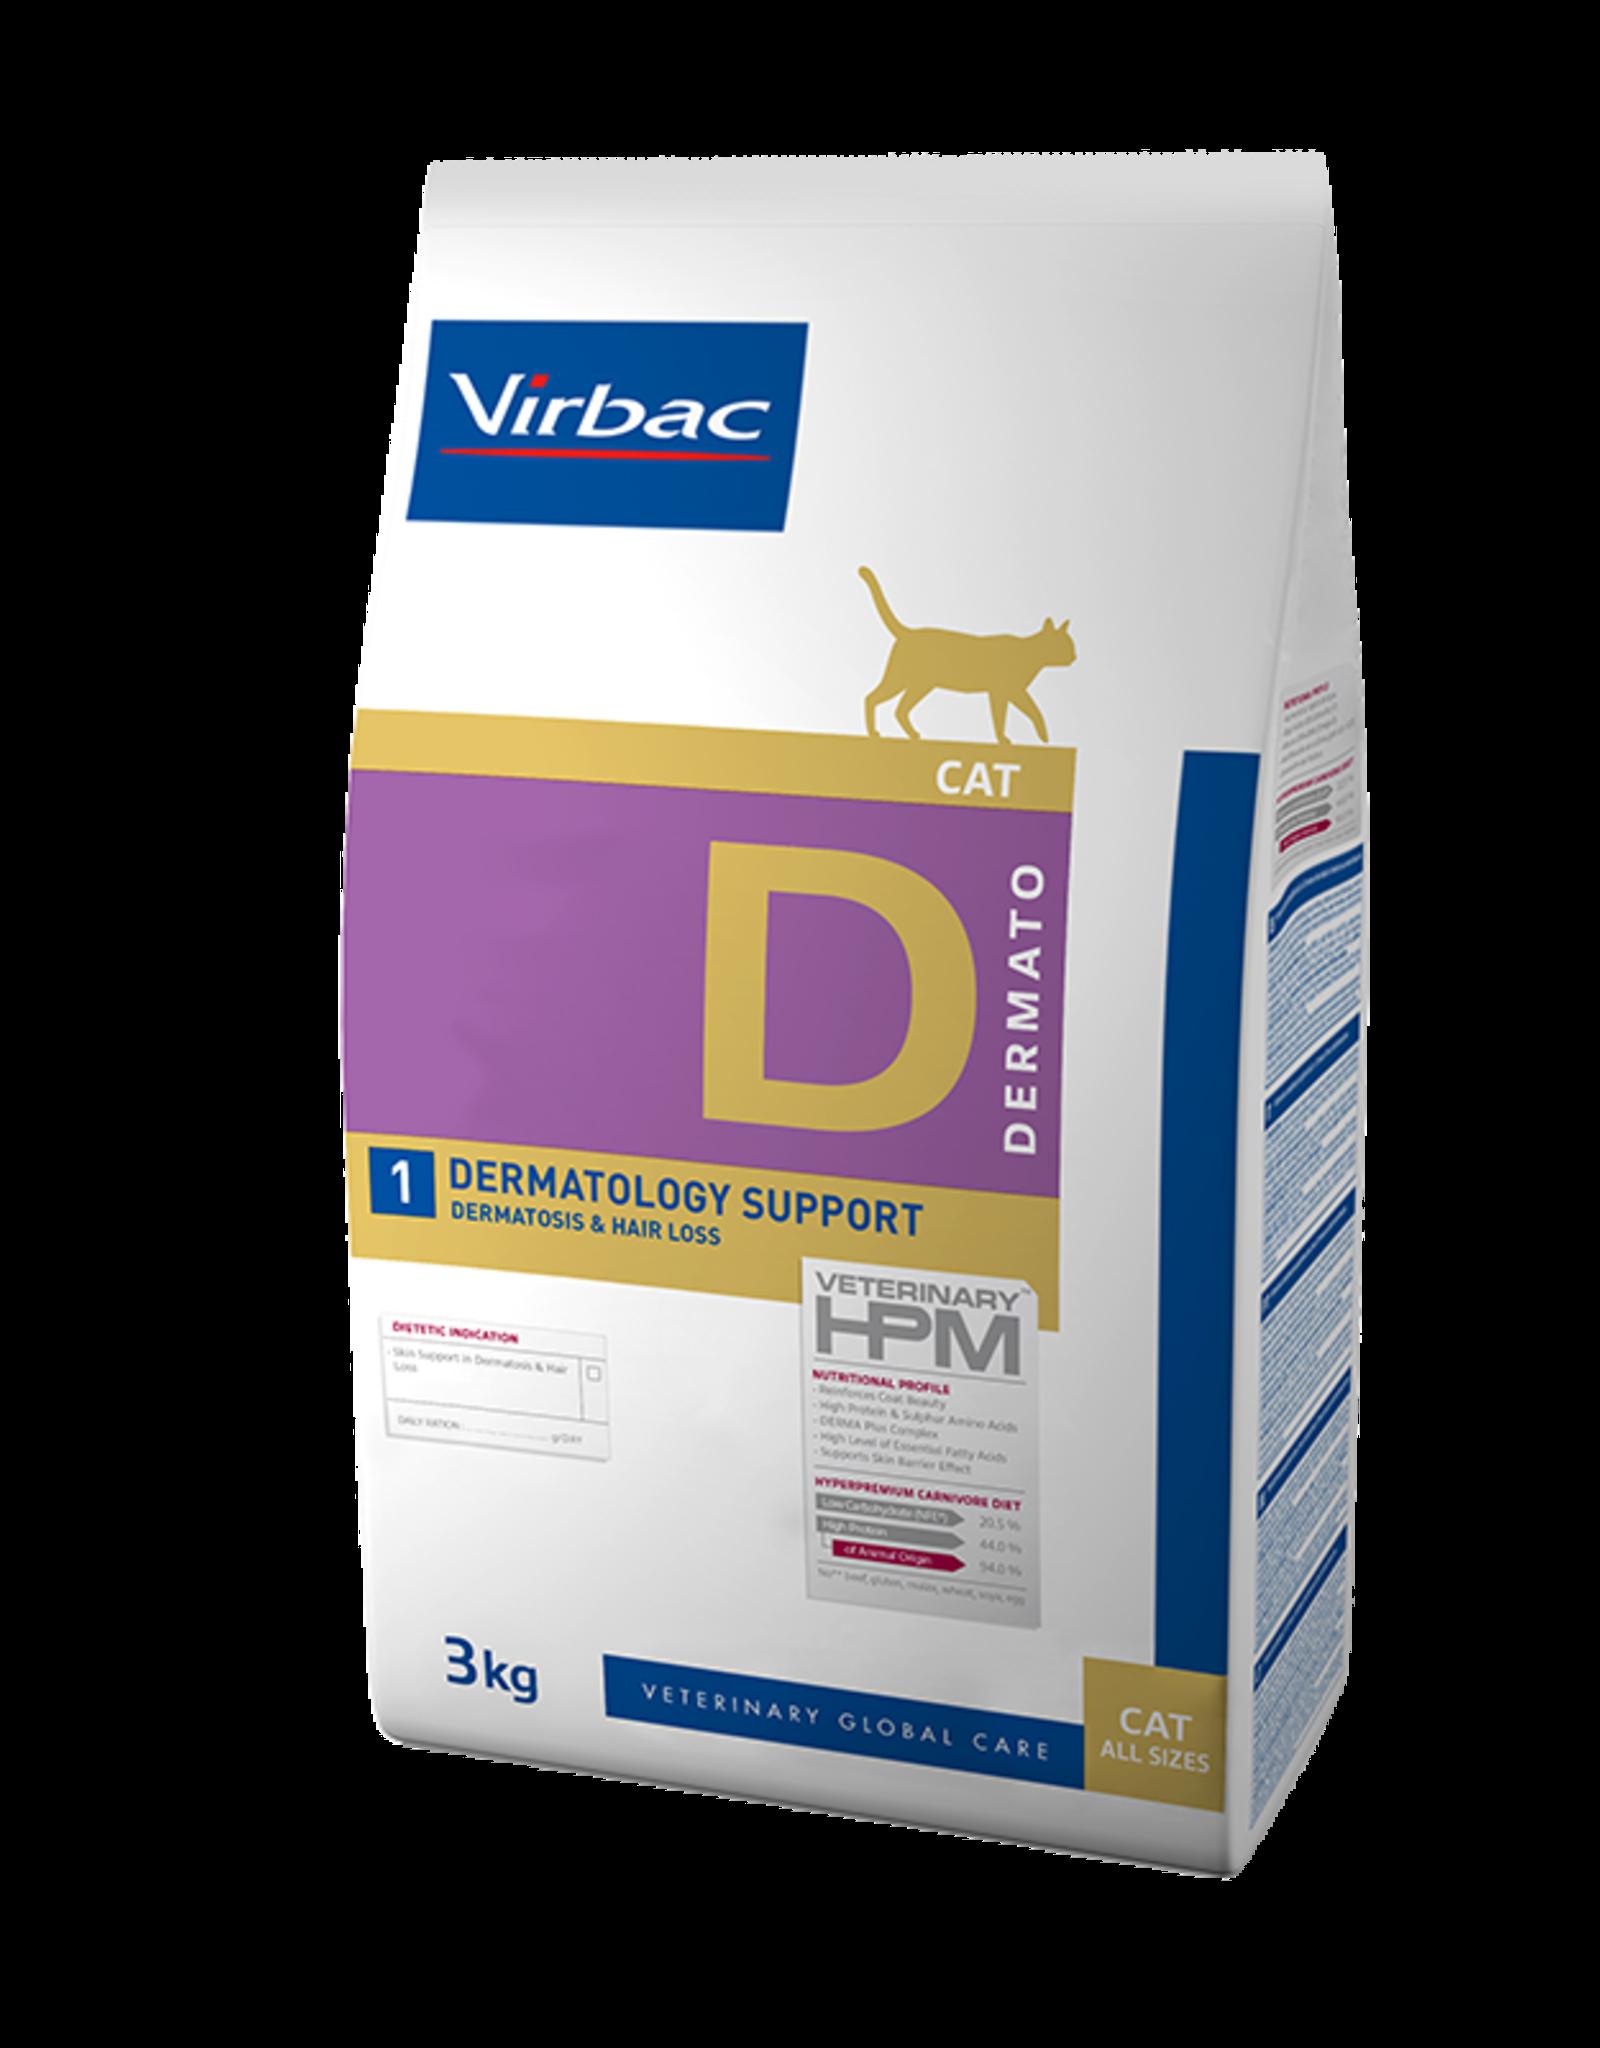 Virbac Virbac Hpm Chat Dermatology Support D1 3kg